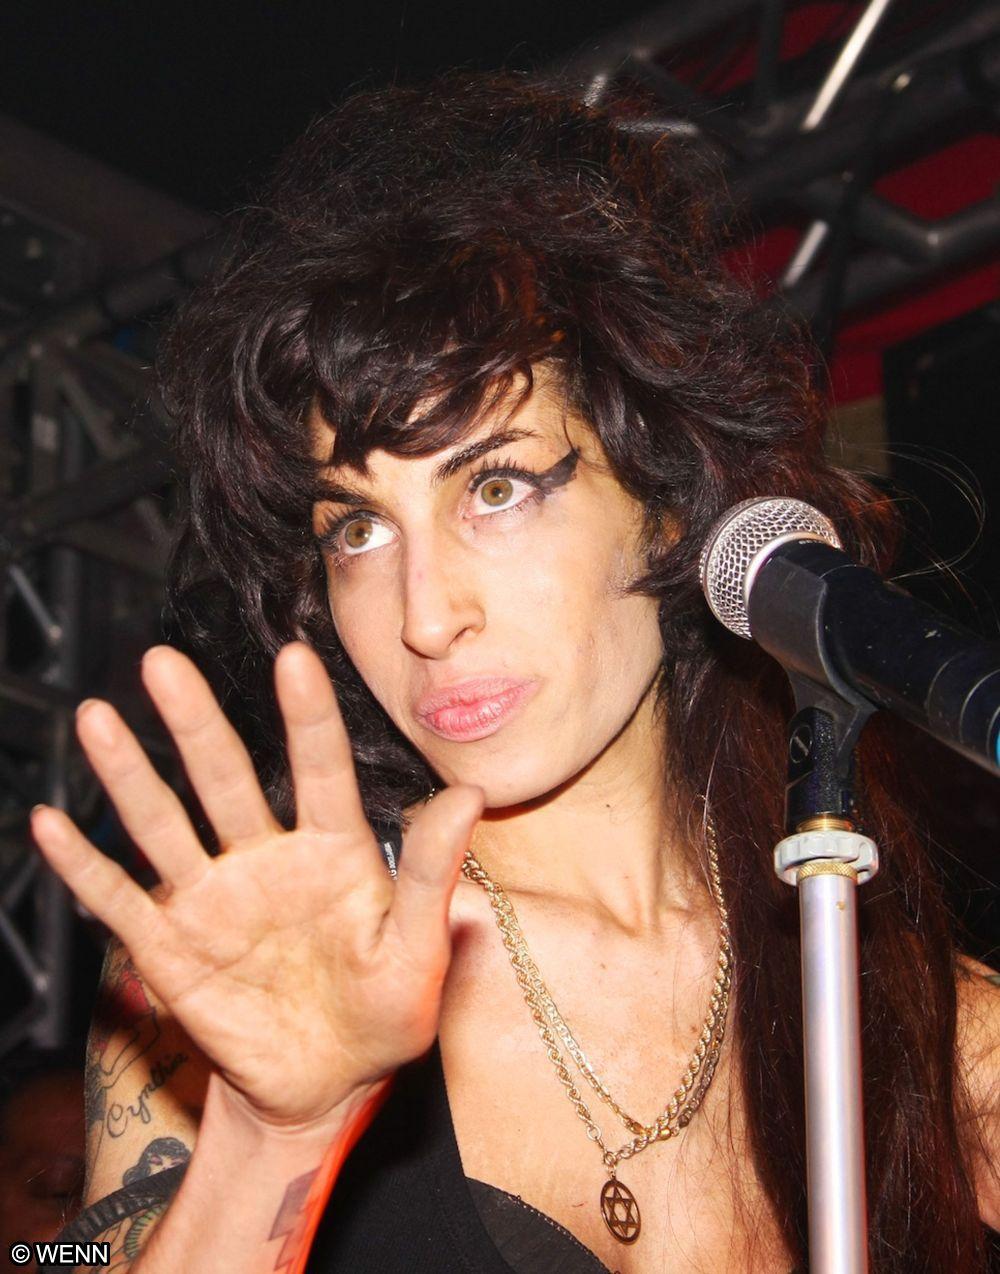 Simian line palmistry tony blair tony bliar - English Singer And Songwriter Amy Winehouse